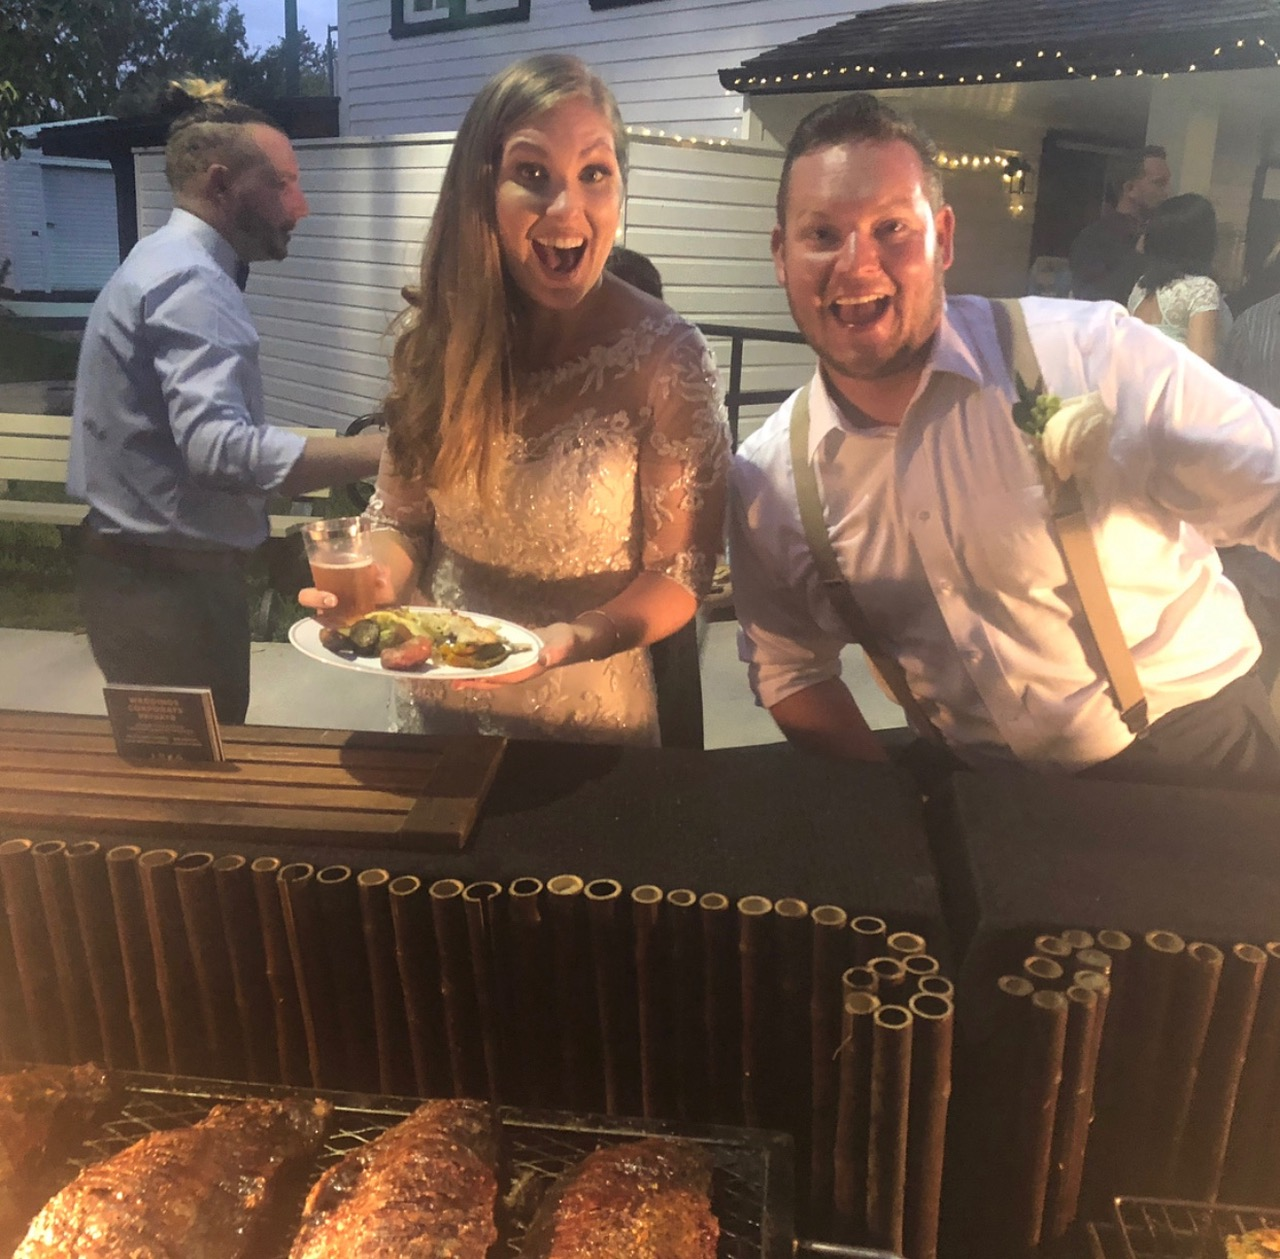 Happy bride and groom loving their steak dinner by Yummy Chori